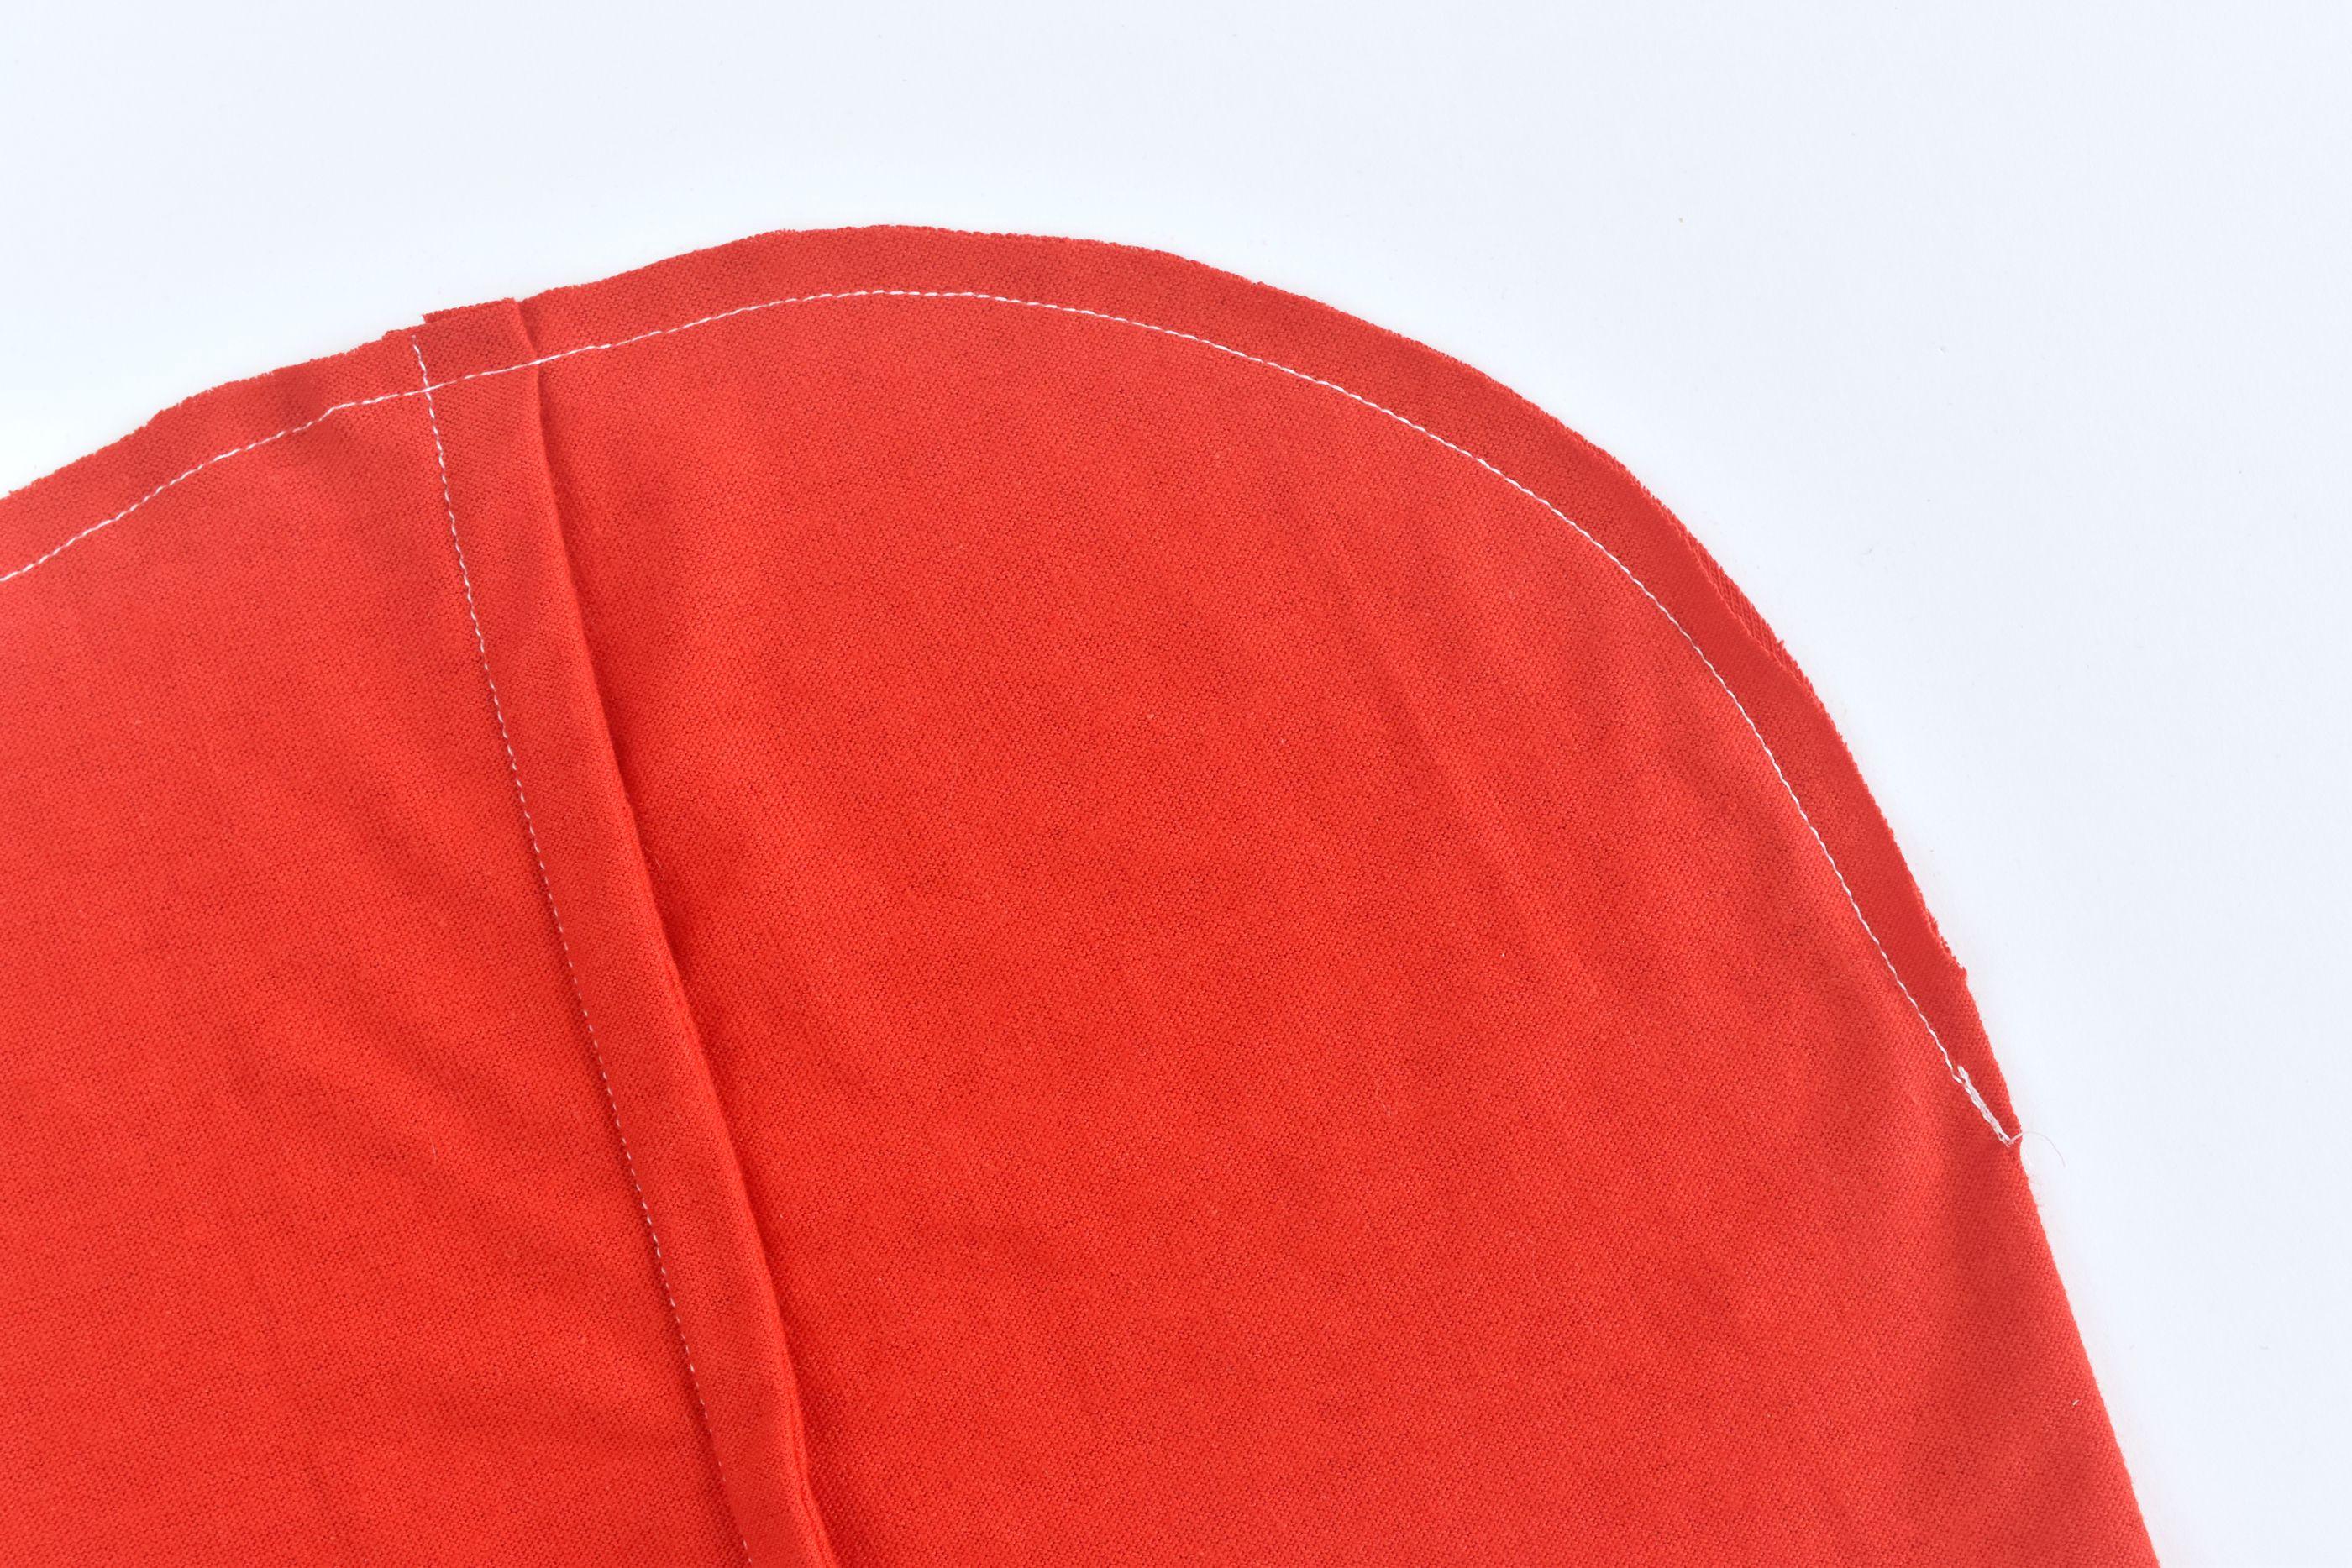 c30b7bdc12e45 Helmet Knit Hat Pattern Free